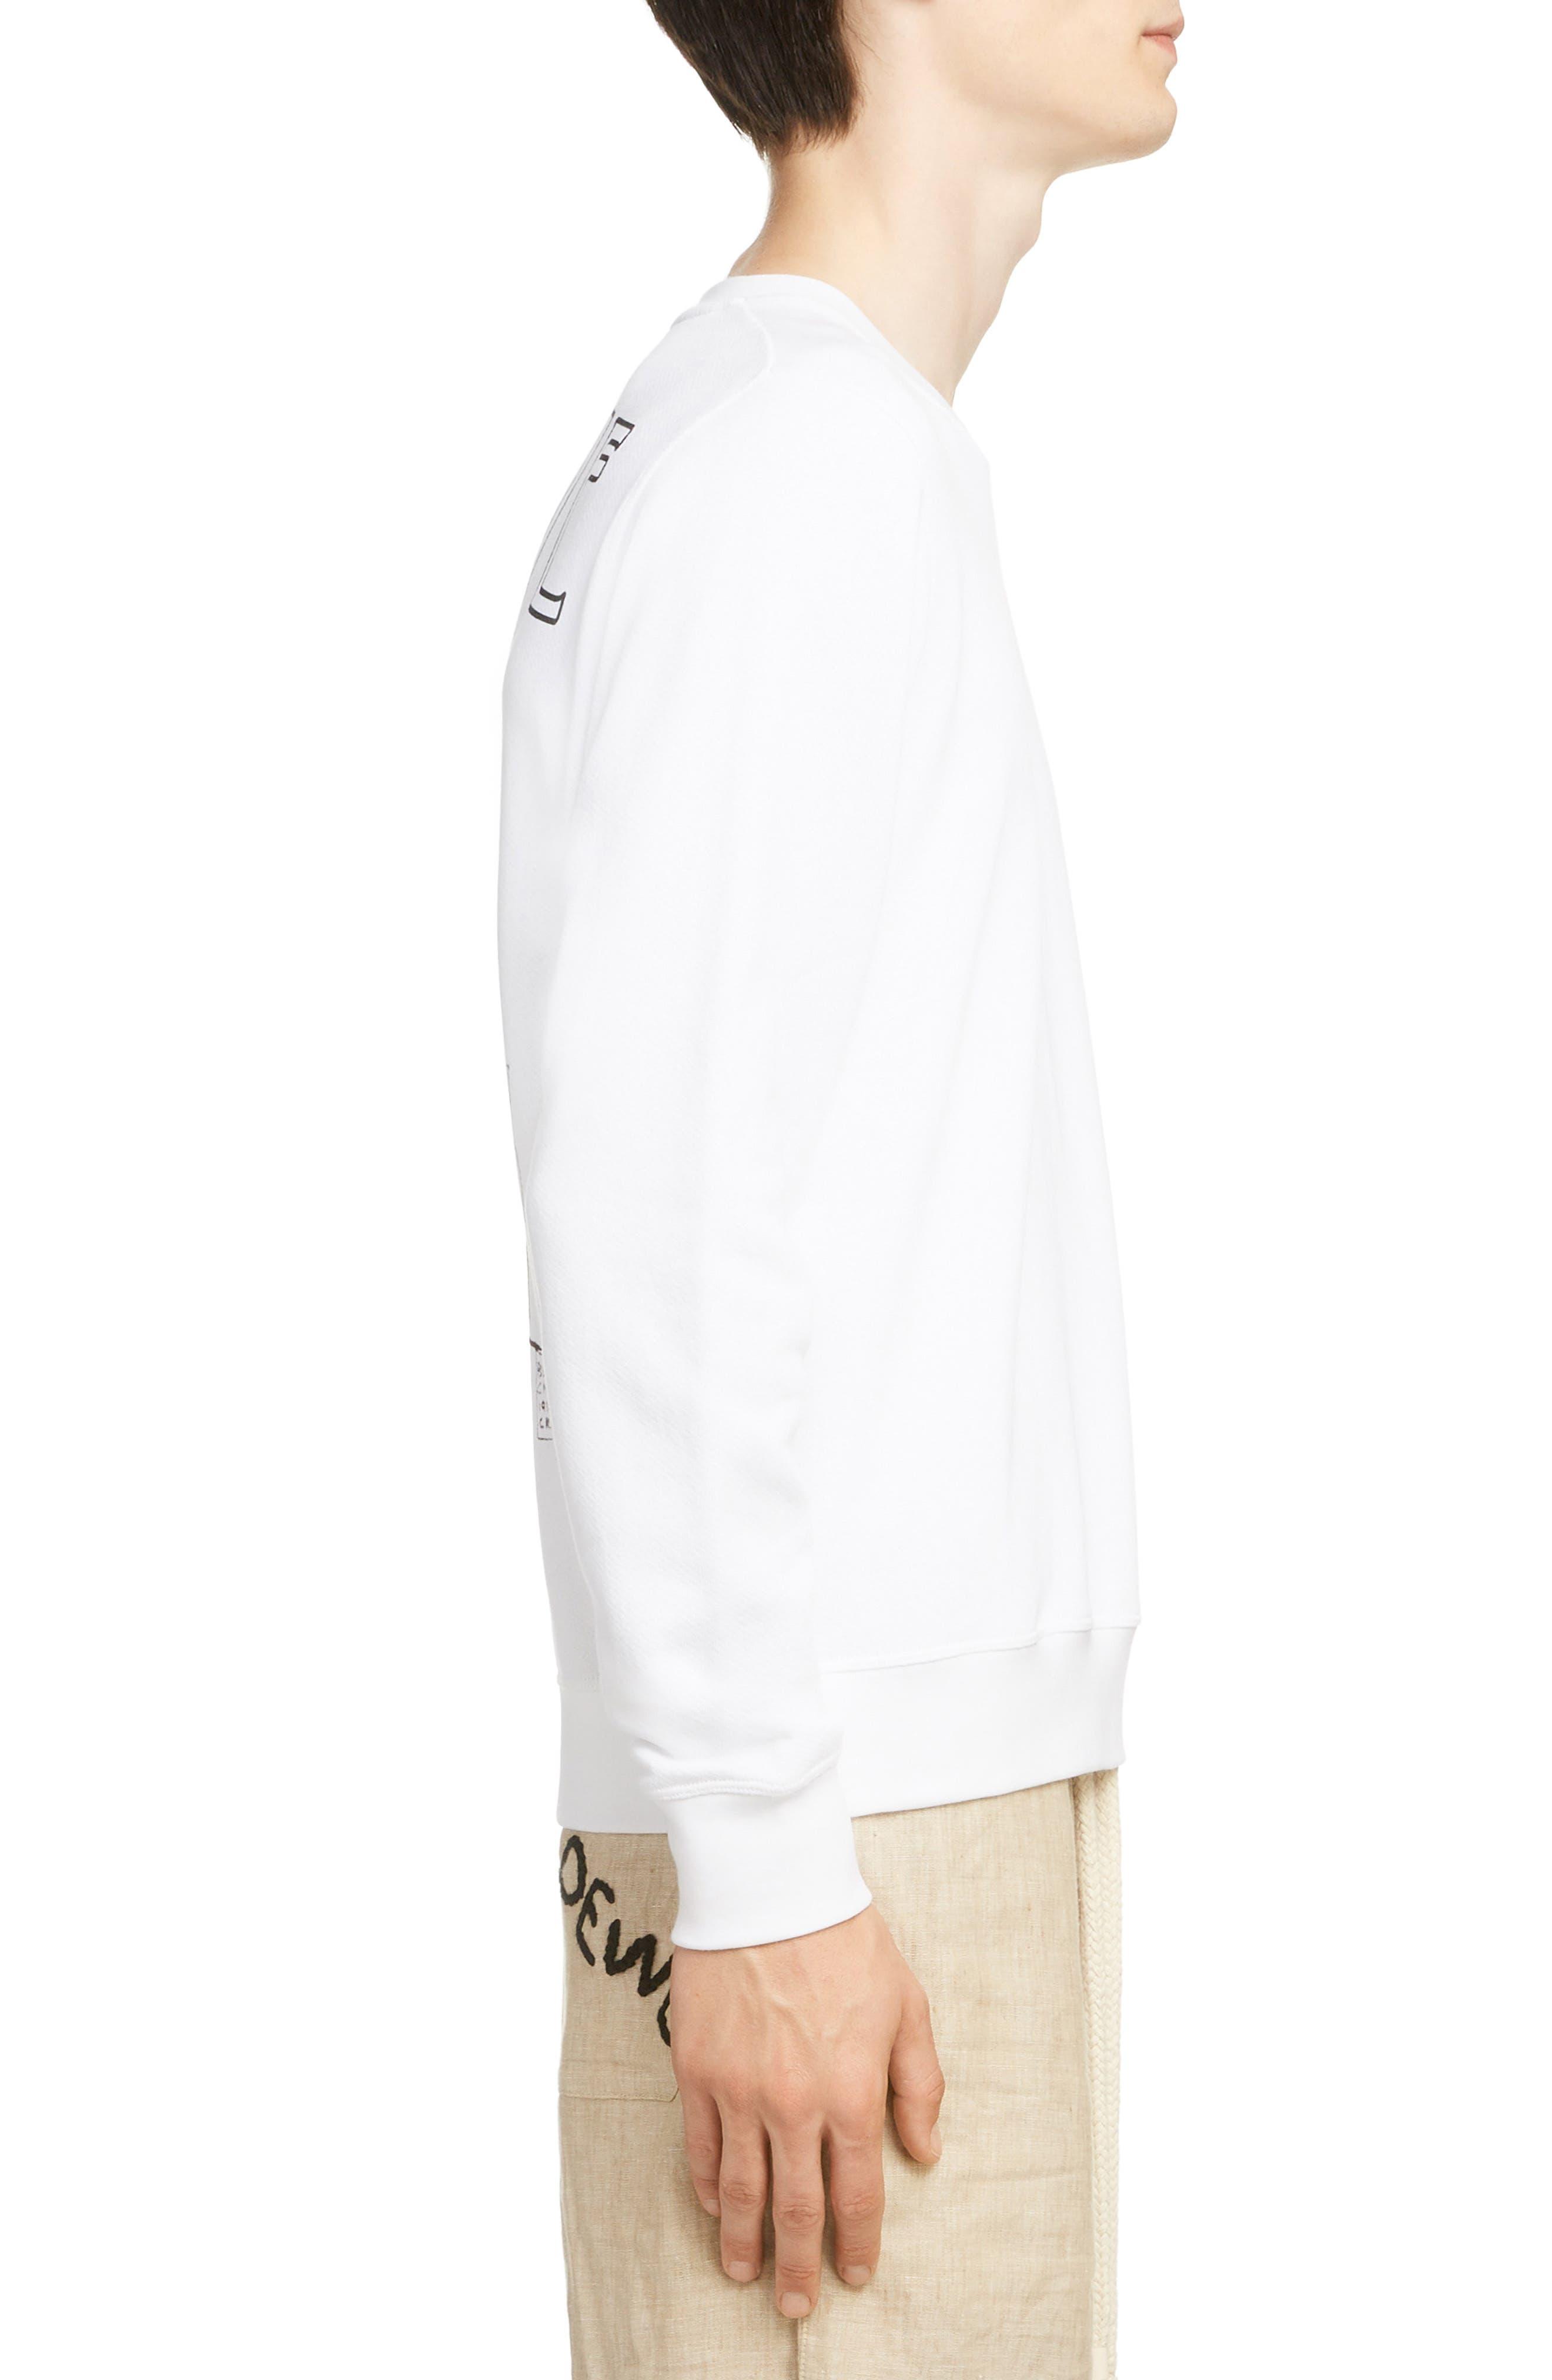 LOEWE, Charles Rennie Mackintosh Collection Botanical Print Sweatshirt, Alternate thumbnail 3, color, 2100-WHITE